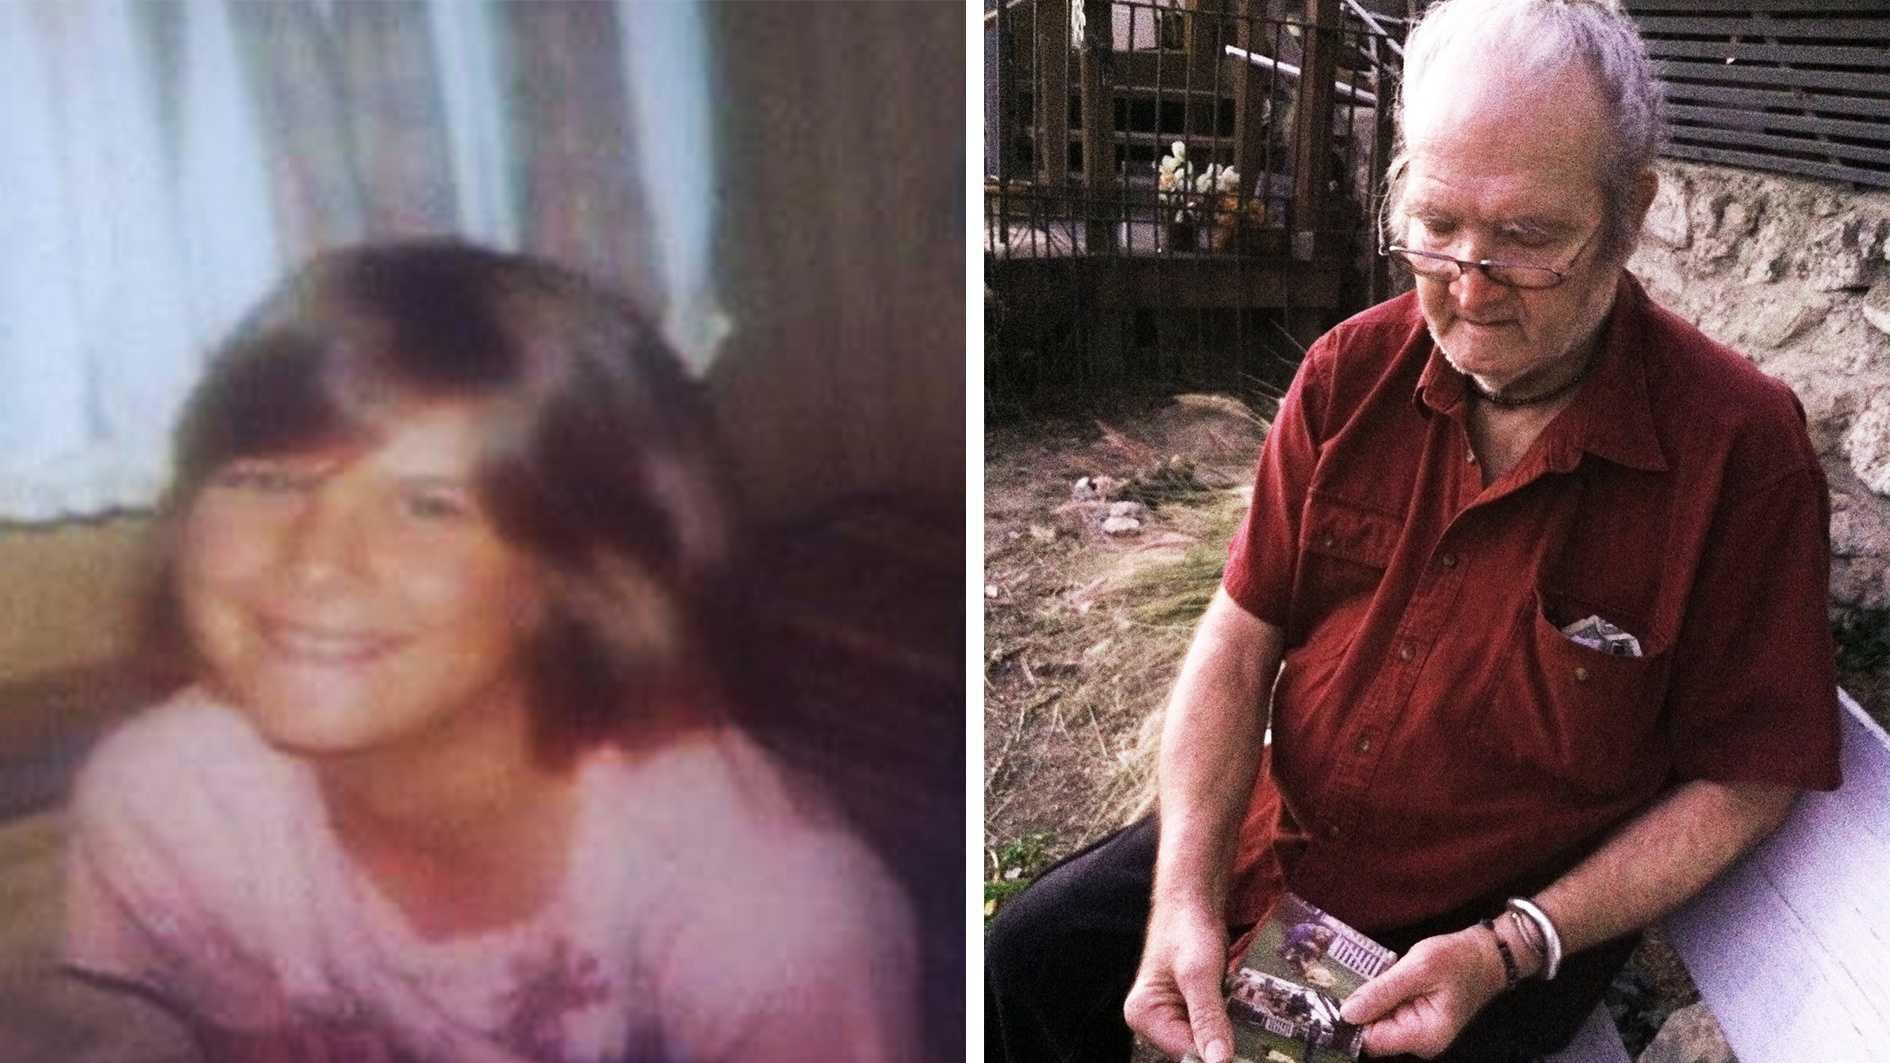 Tammy Jarschke, left, and her father, Gary Jarschke, right.